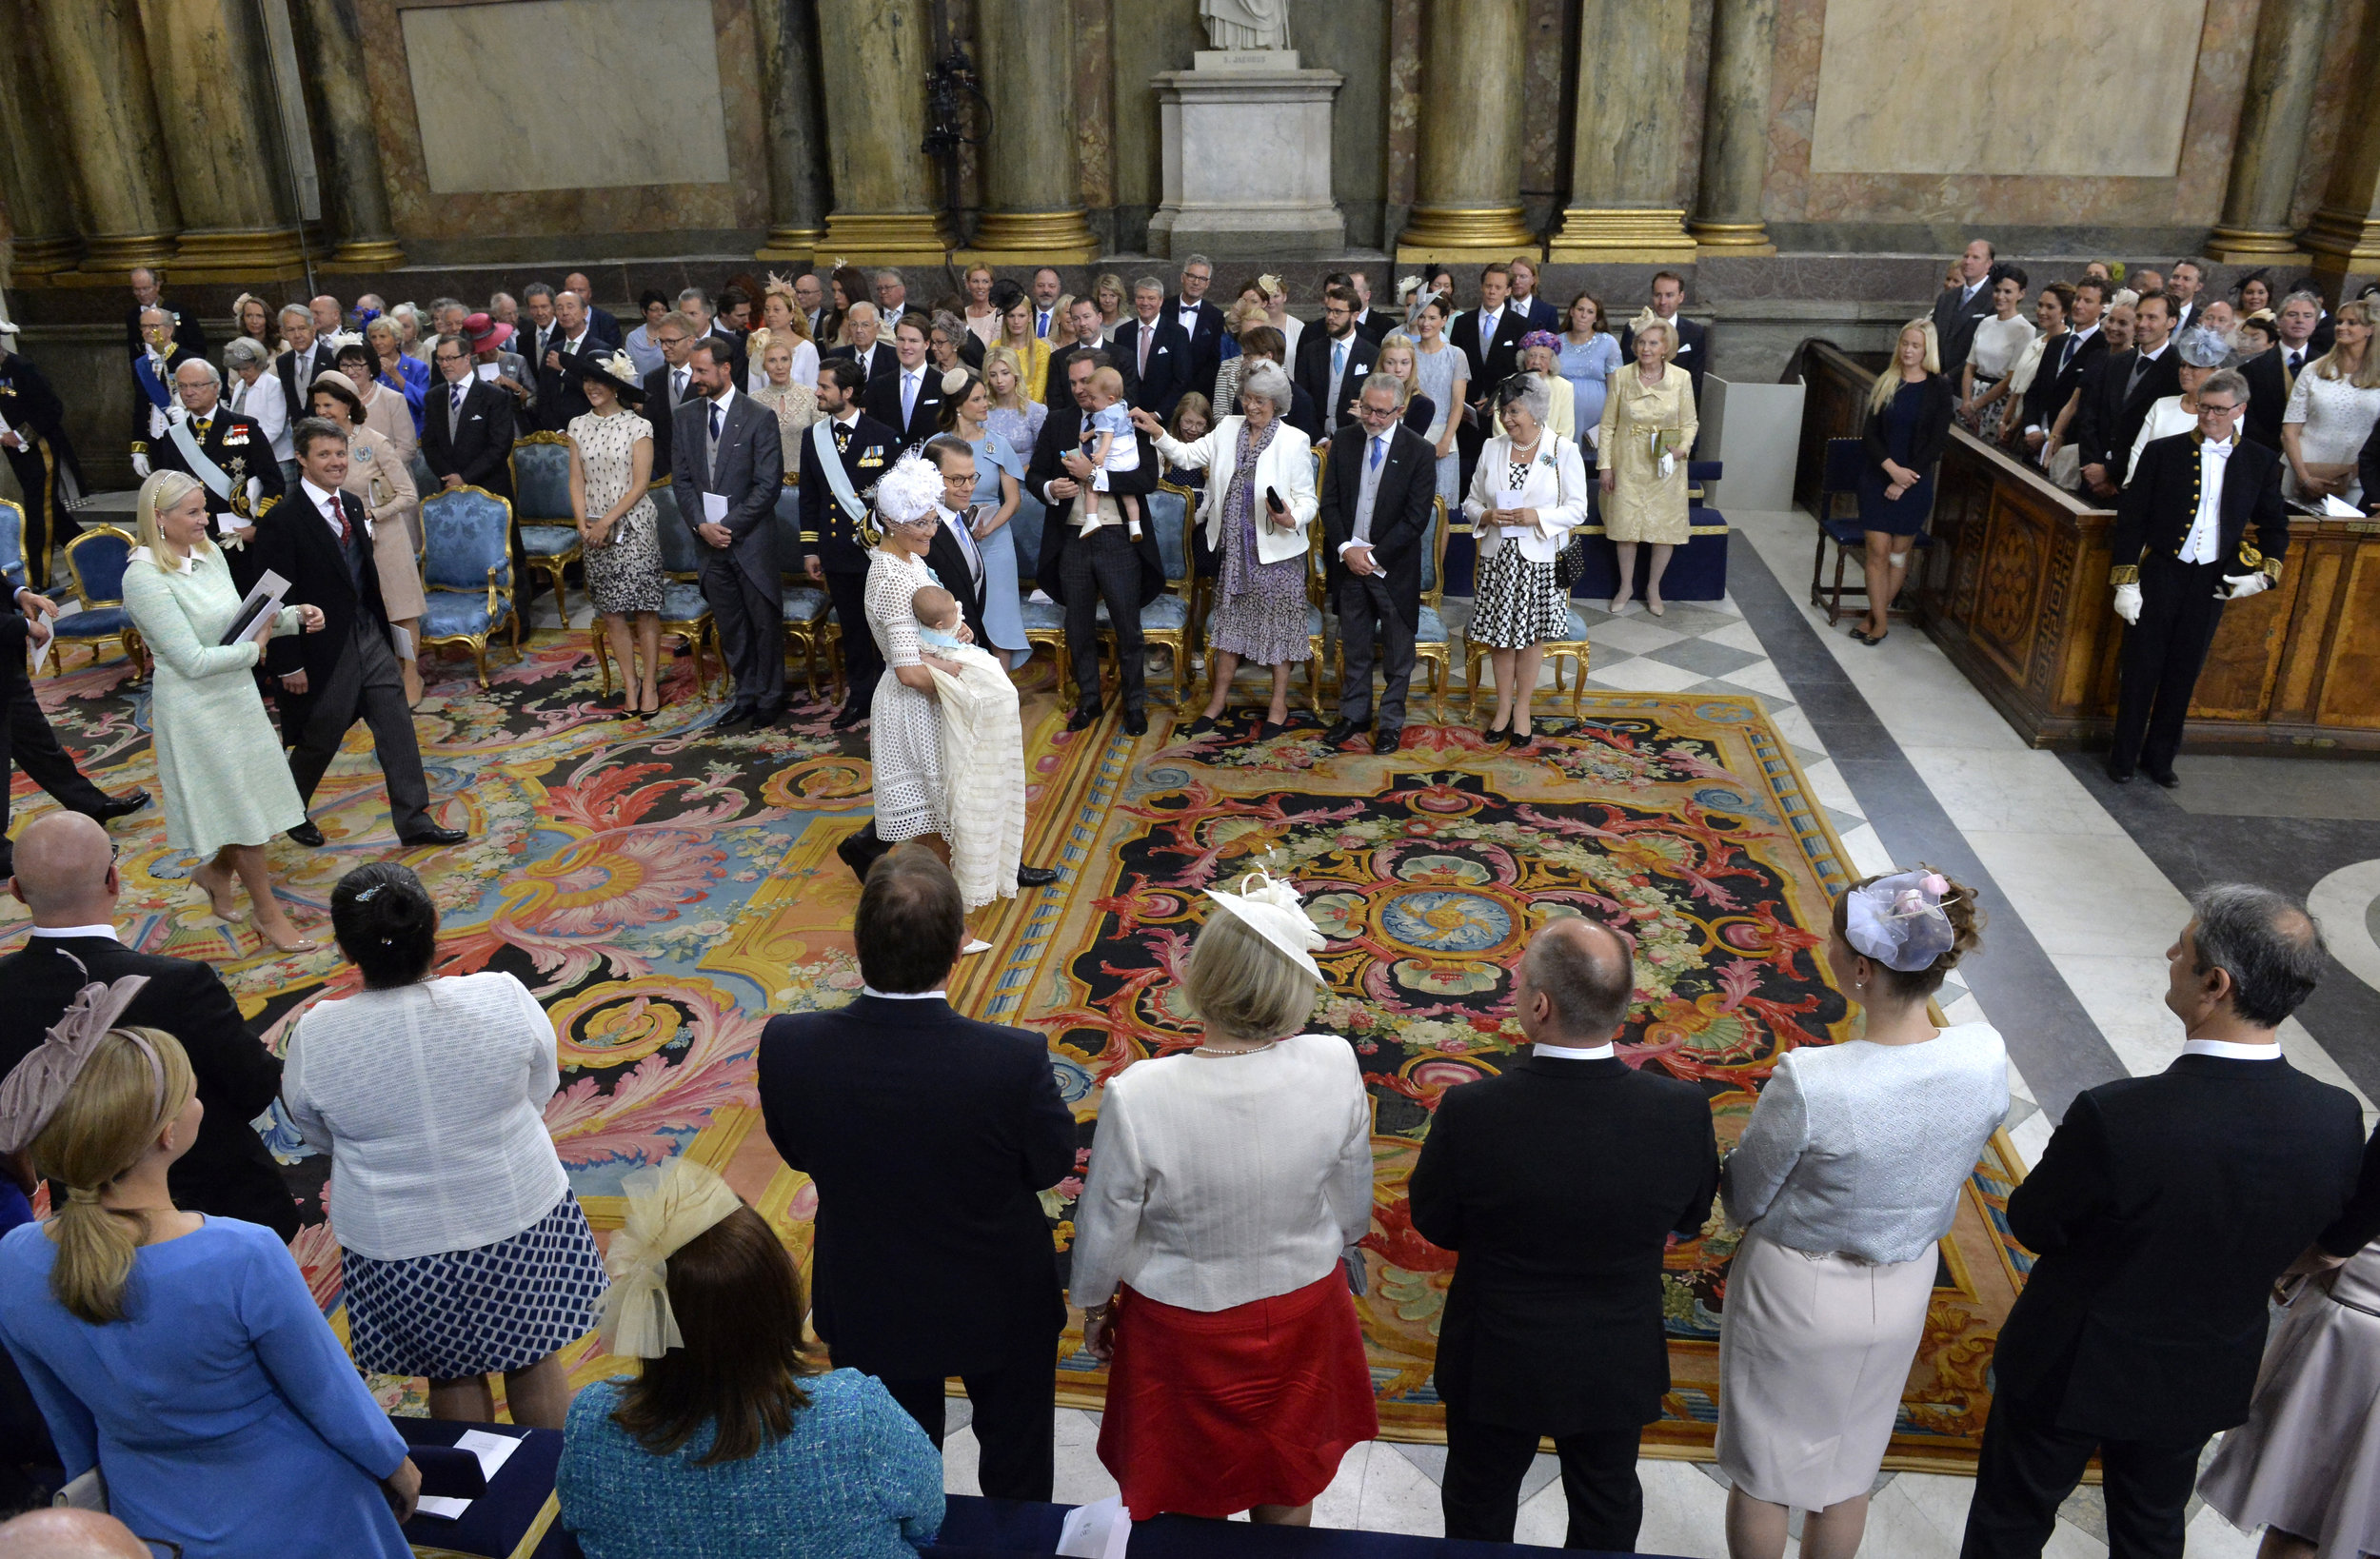 Prince Oscar's christening.Photo: Jonas Ekströmer, TT/The Royal Court, Sweden